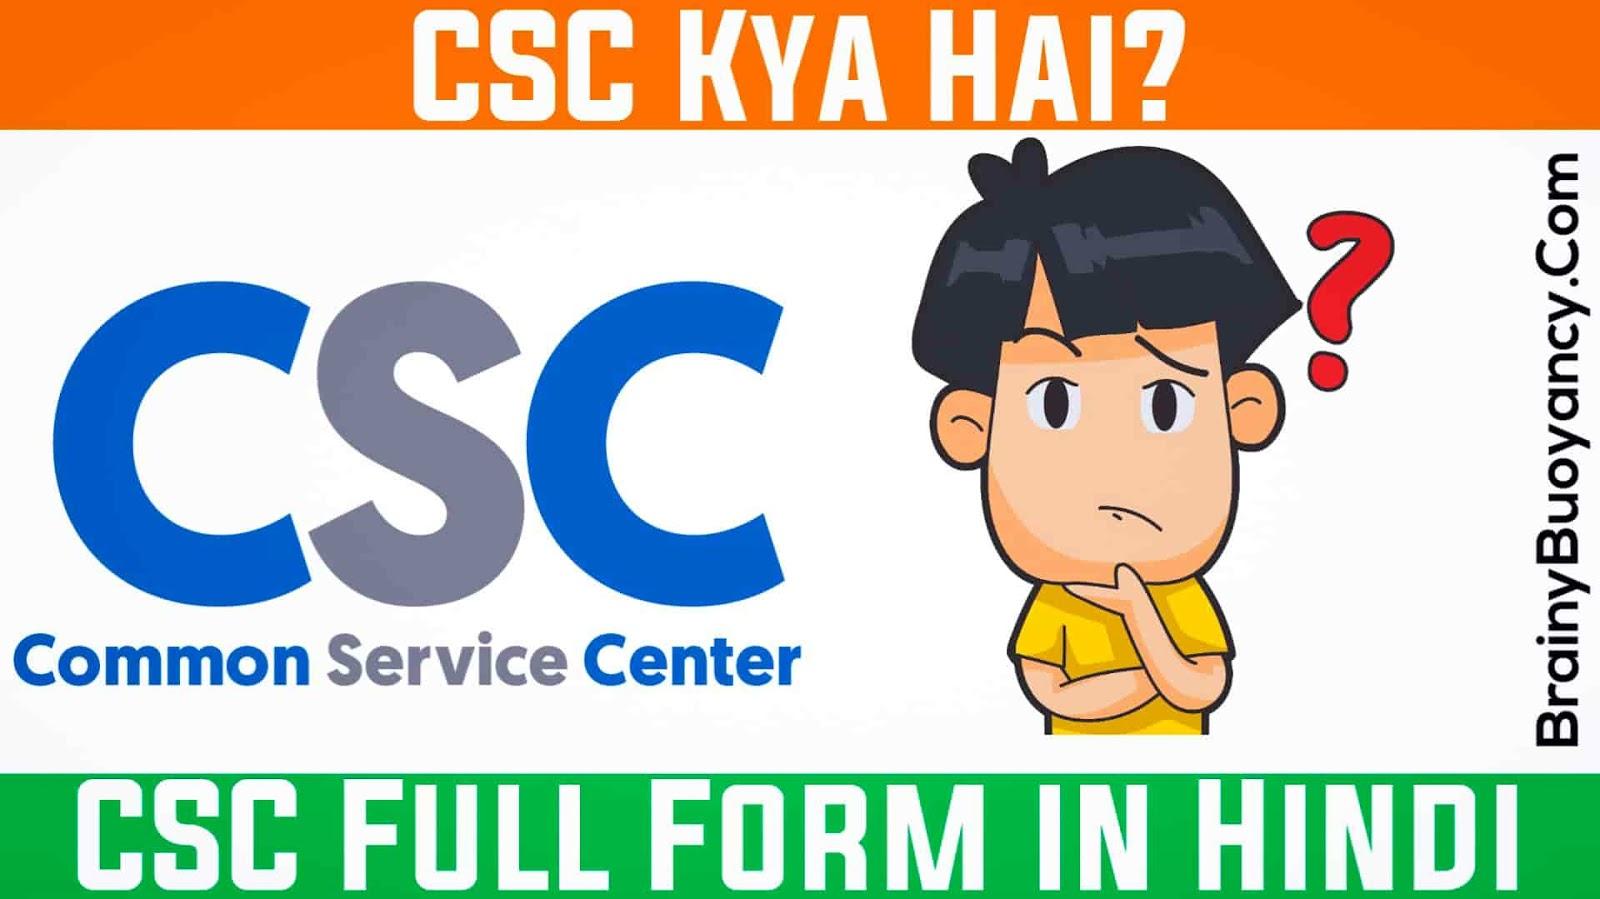 CSC Kya Hai? - CSC Full Form in Hindi